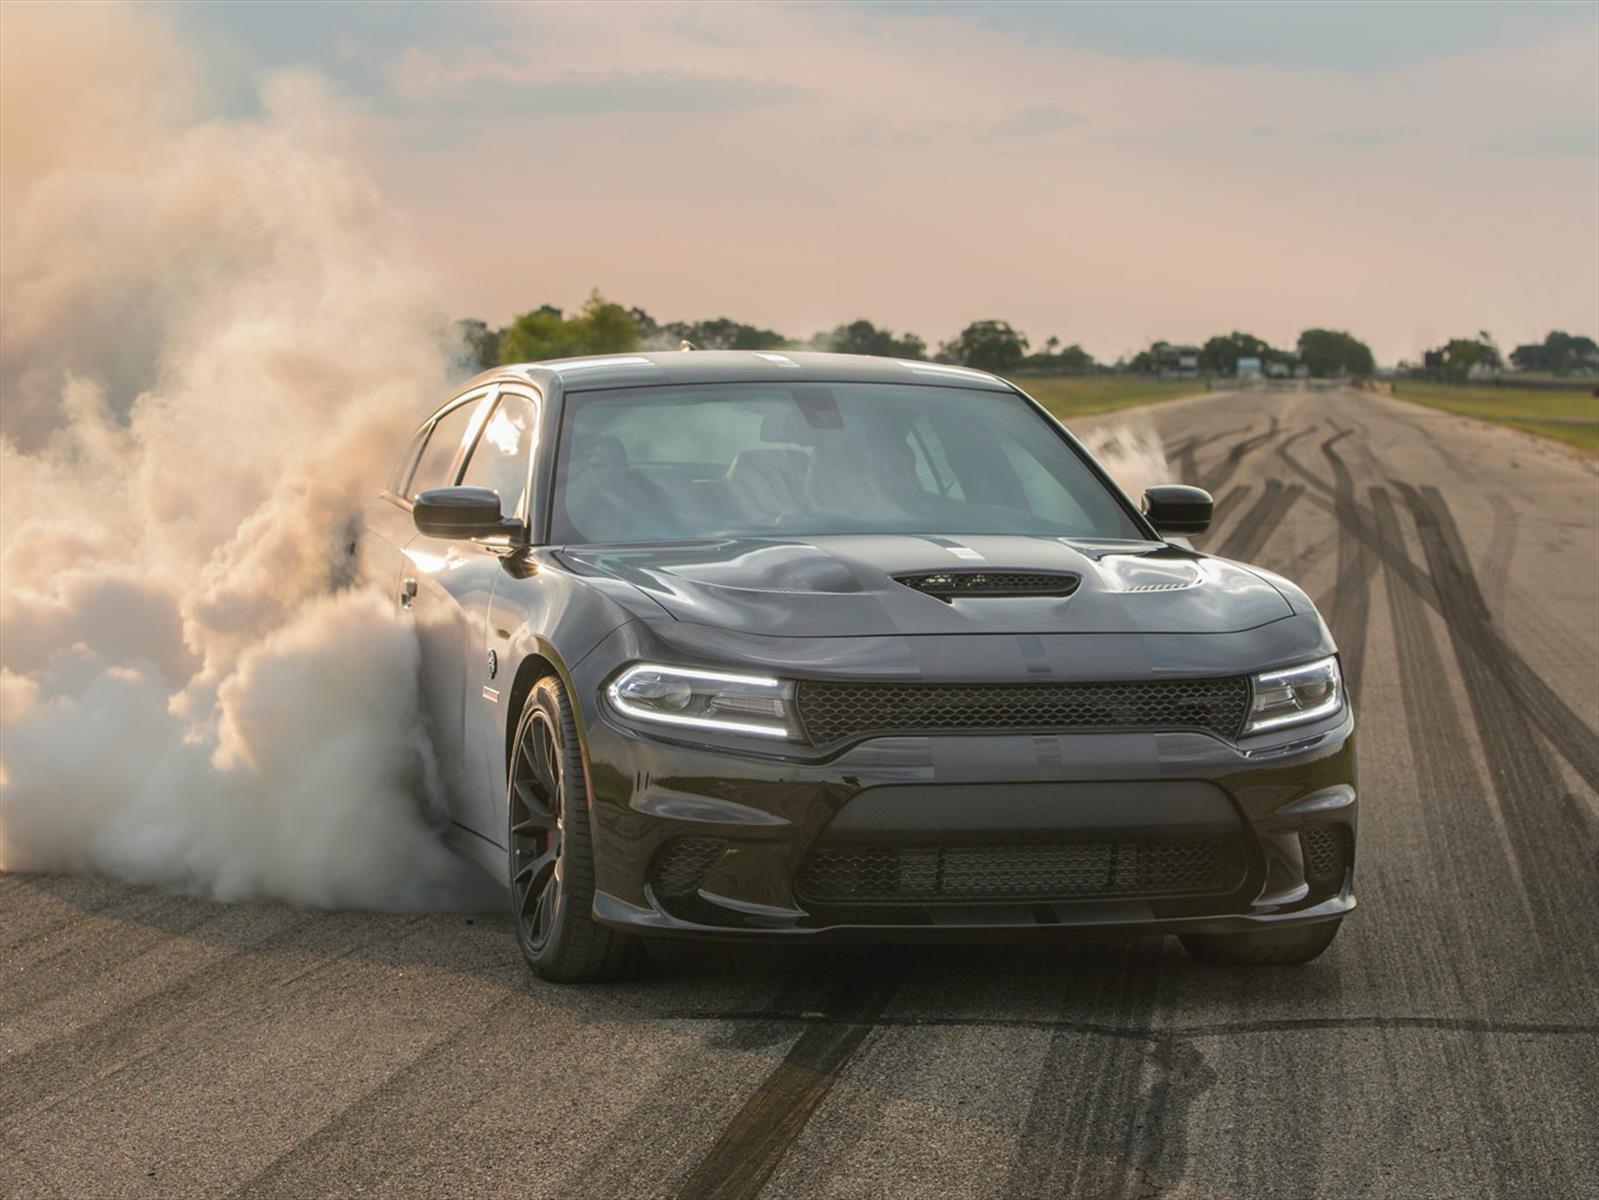 Hennessey Performance tunea al Dodge Charger SRT Hellcat